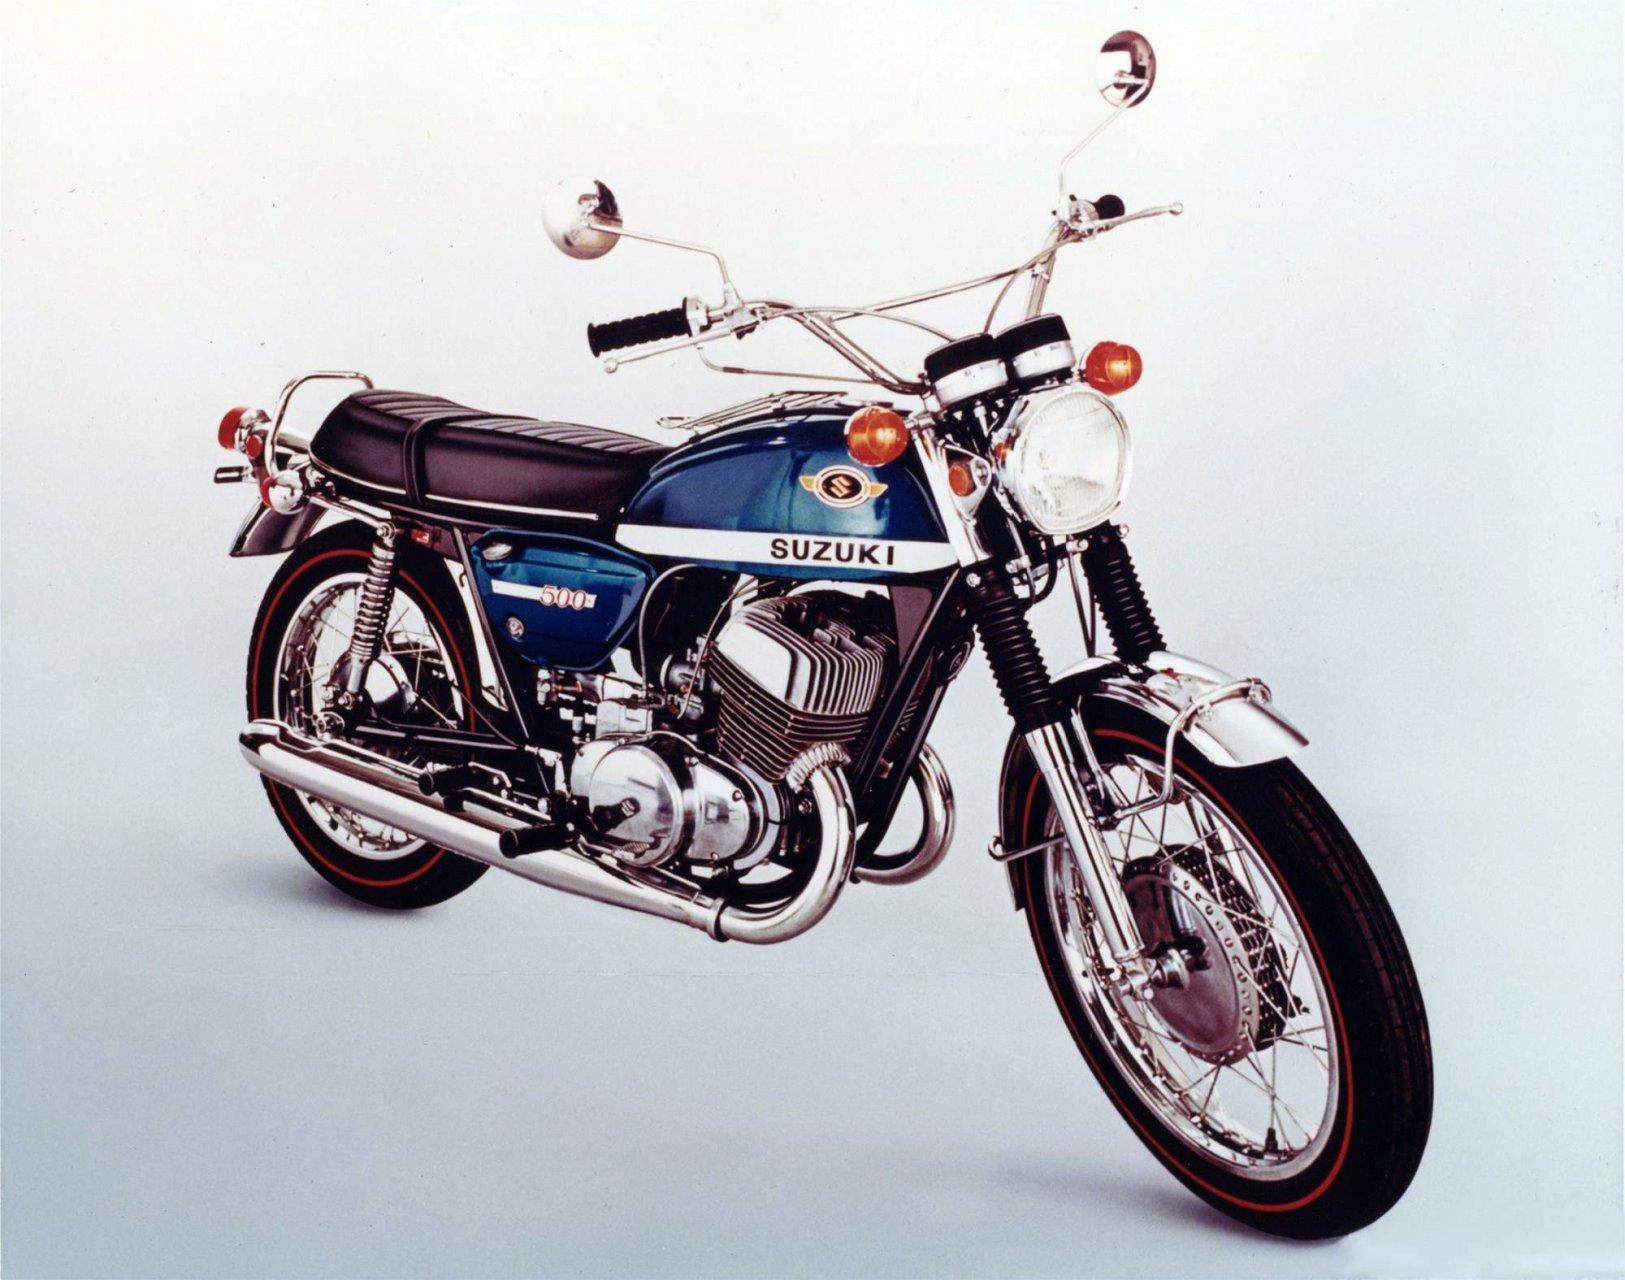 1972 Suzuki T500 III Titan